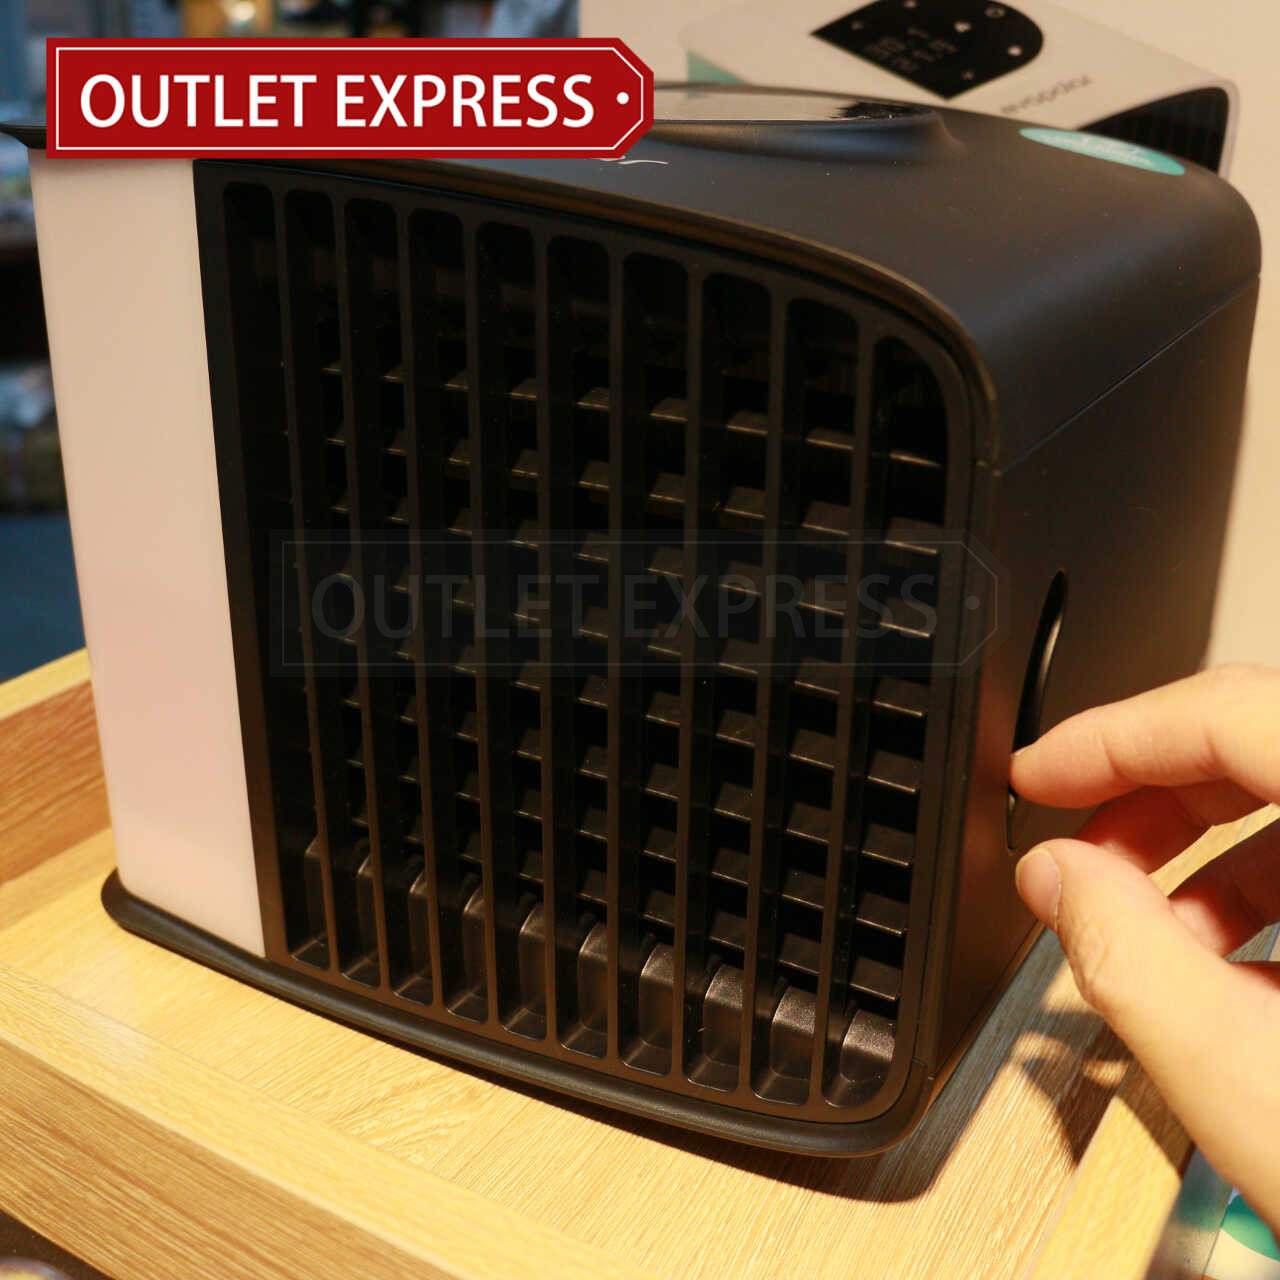 Evapolar 二代小型個人流動冷氣機 (evaSMART EV-3000) | 智能水冷風機 ( 現貨發售 ) | 香港行貨 風葉- Outlet Express HK生活百貨城實拍相片